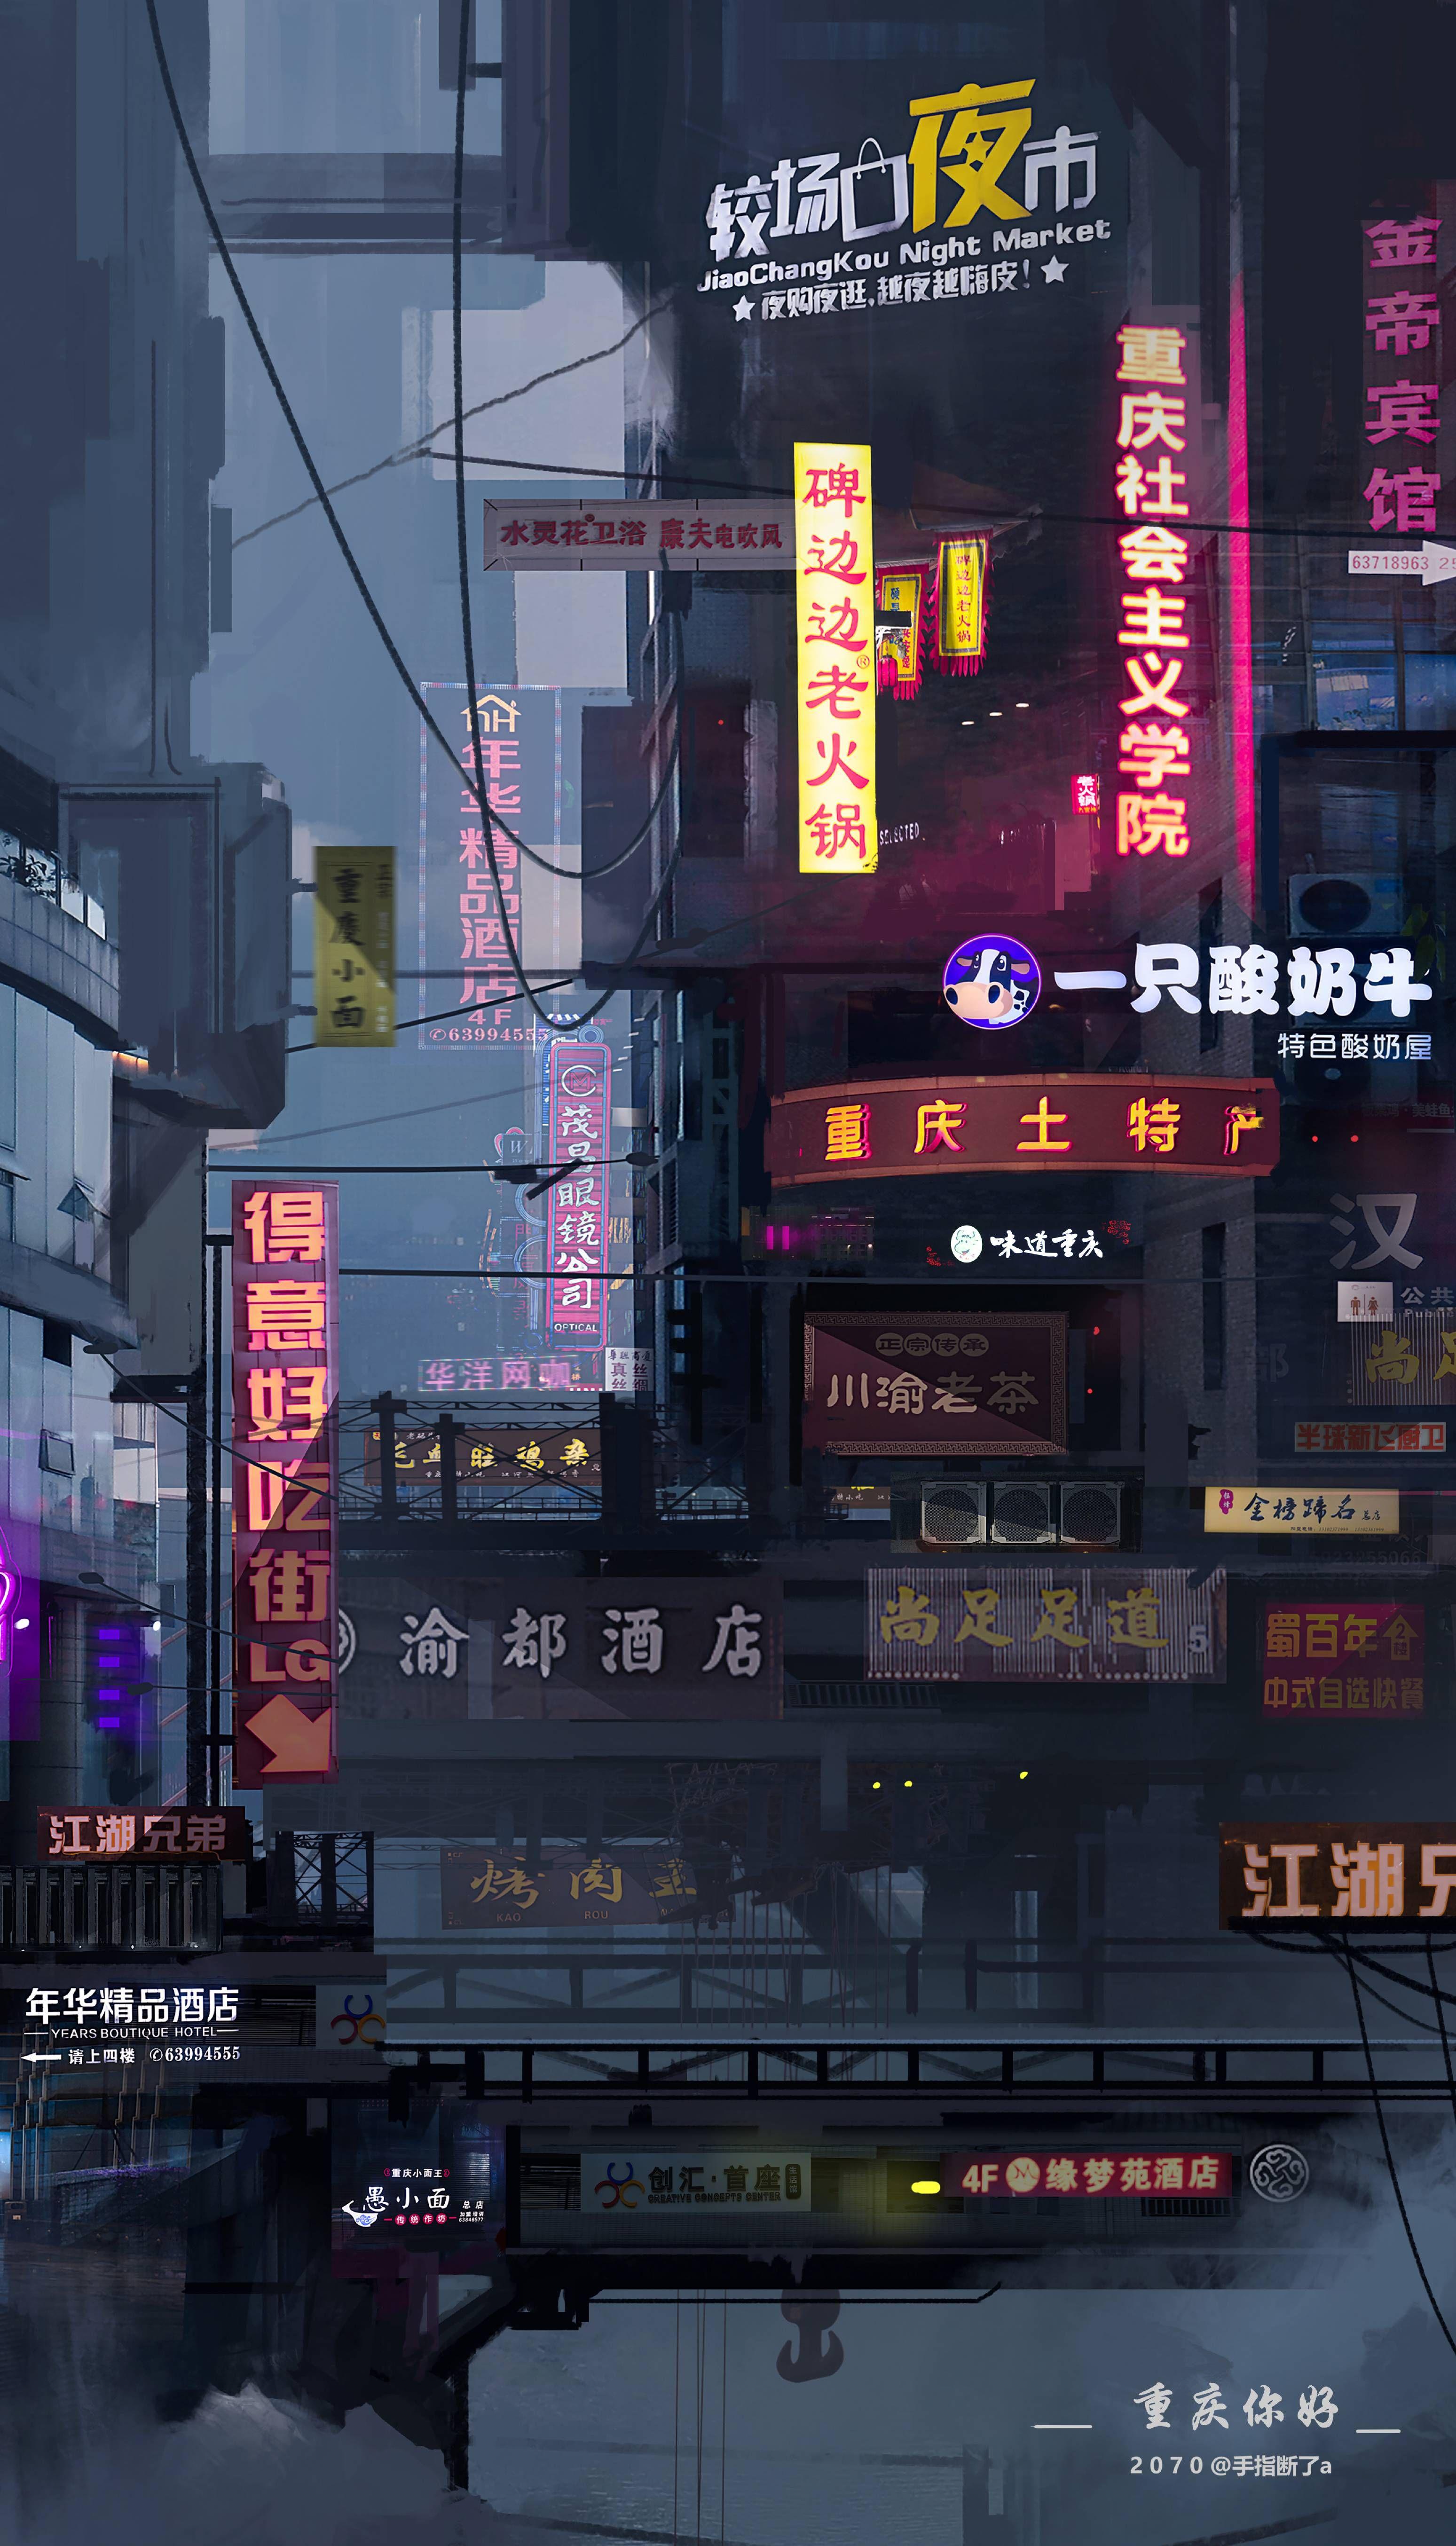 Hello Chongqing Anime Scenery Wallpaper Pixel Art Background Cyberpunk City